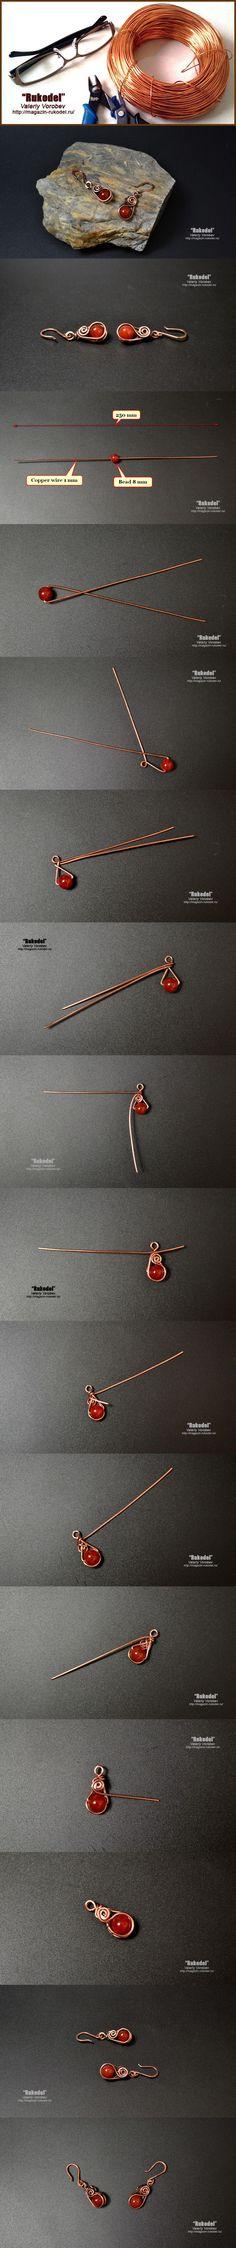 Wire Wrapped Earrings. Серьги из проволоки